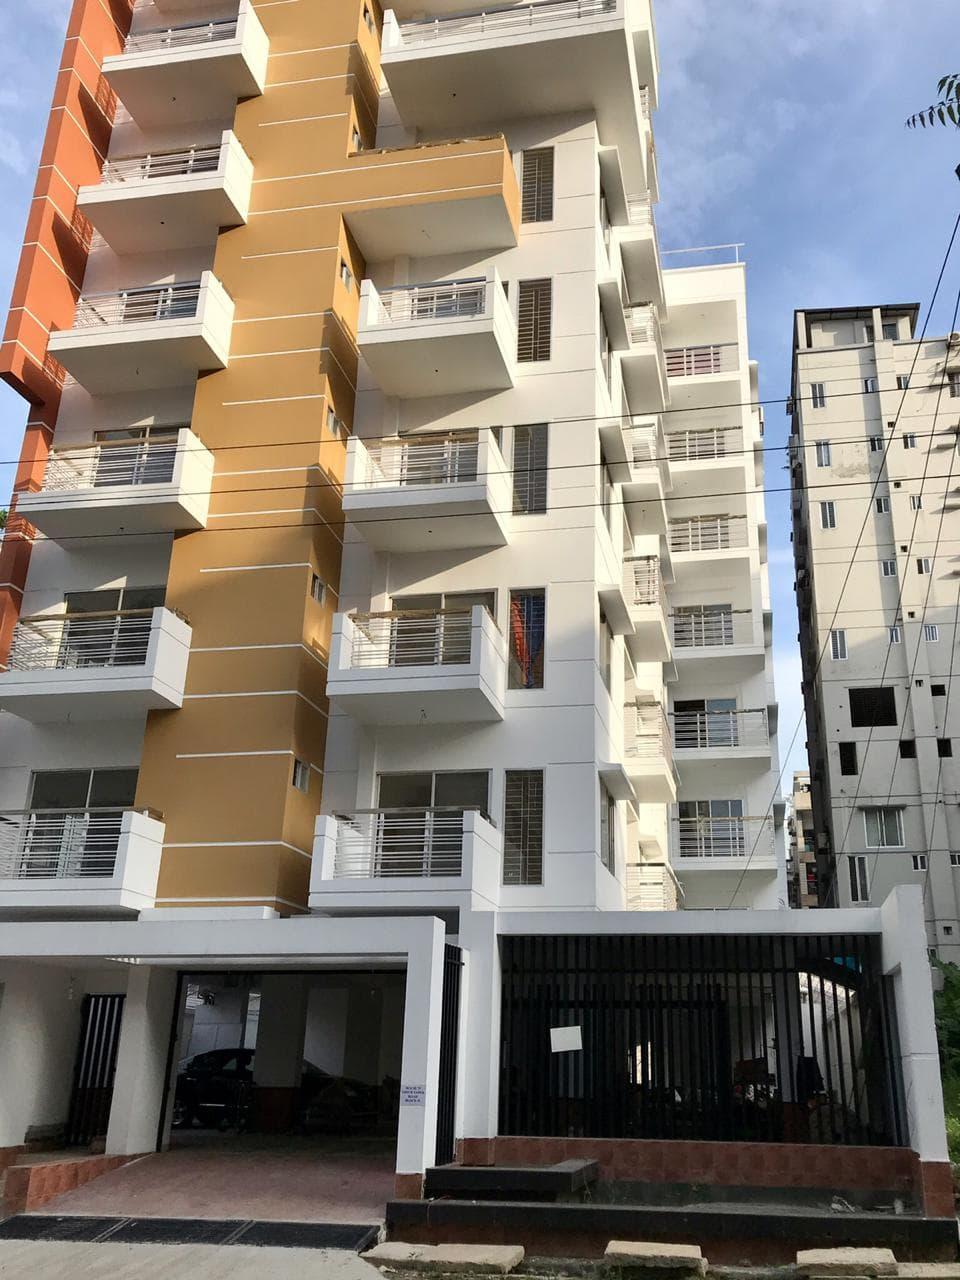 1671sft 5th floor very Luxurious residential Apt 3bed 3bath lift 1park Brand new apt